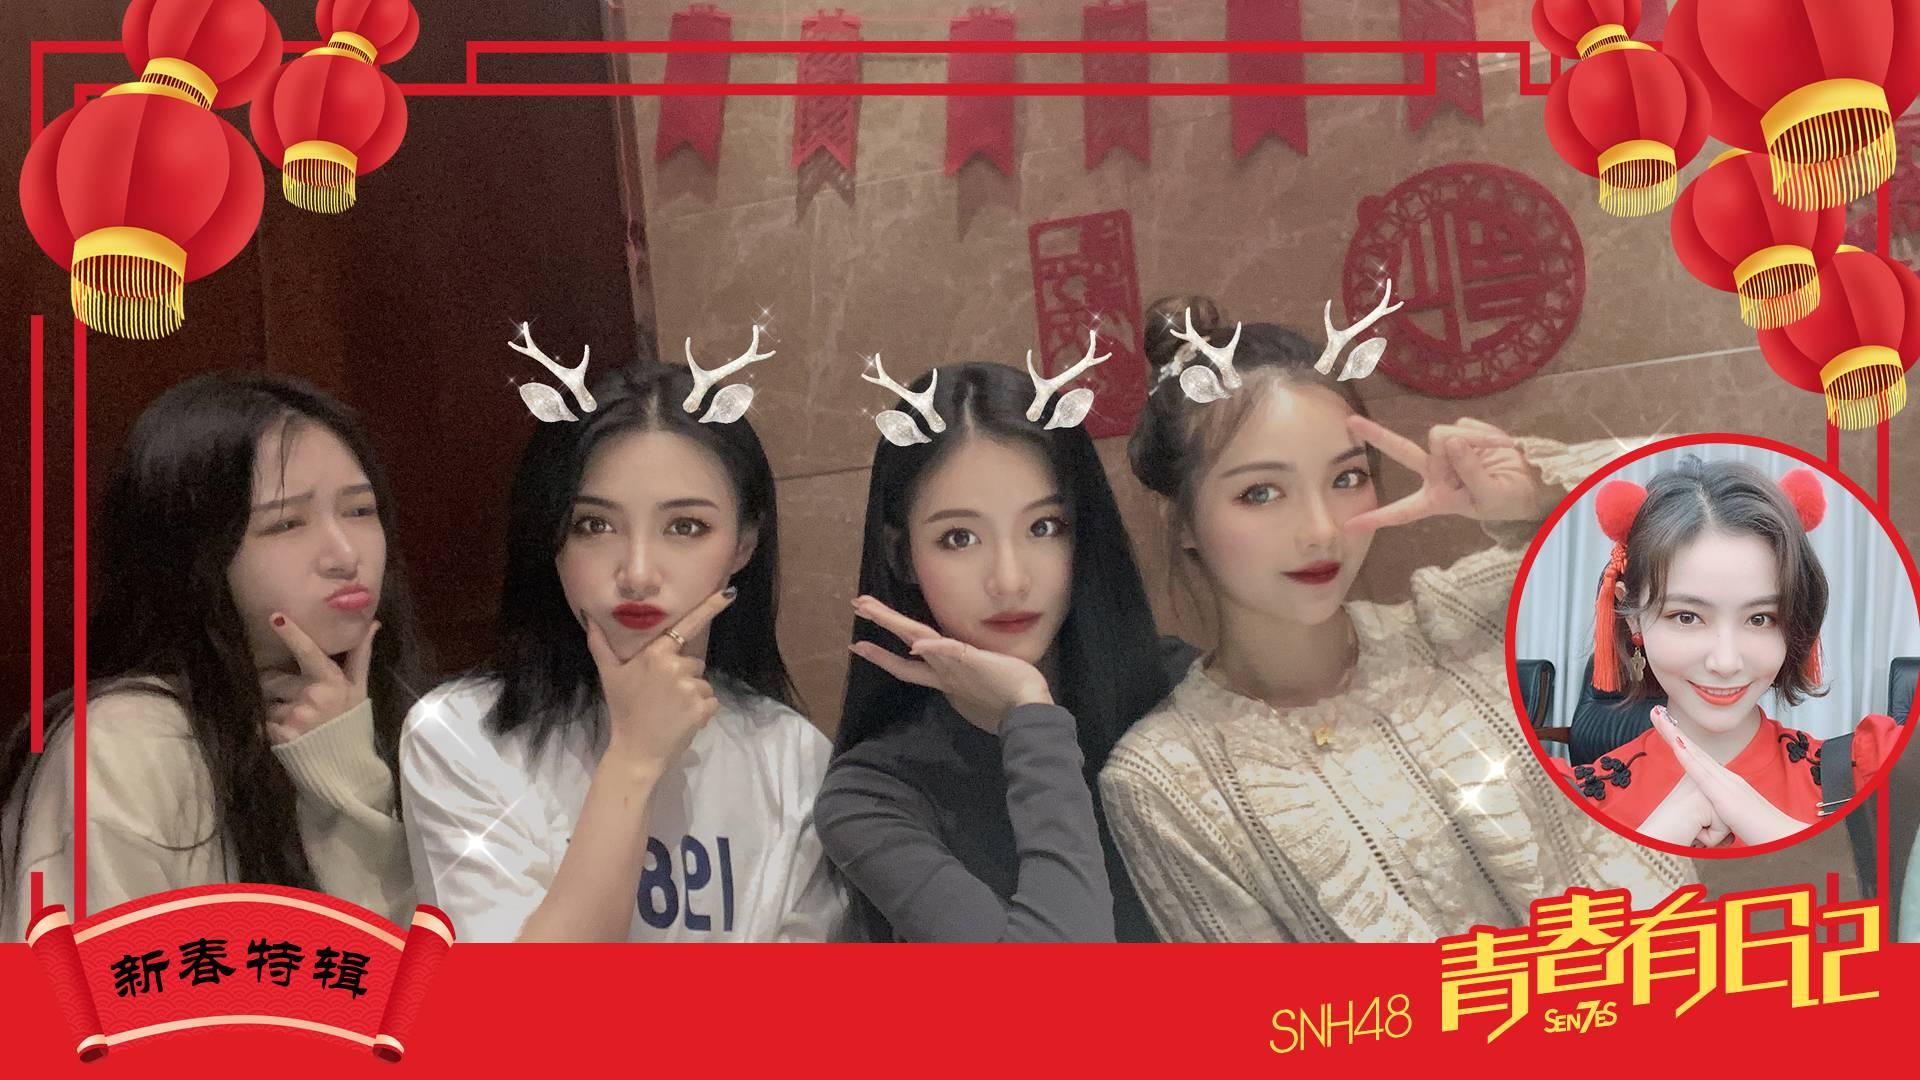 【SNH48-7SENSES】《青春有你2》限定vlog《青春有日记》新春特辑